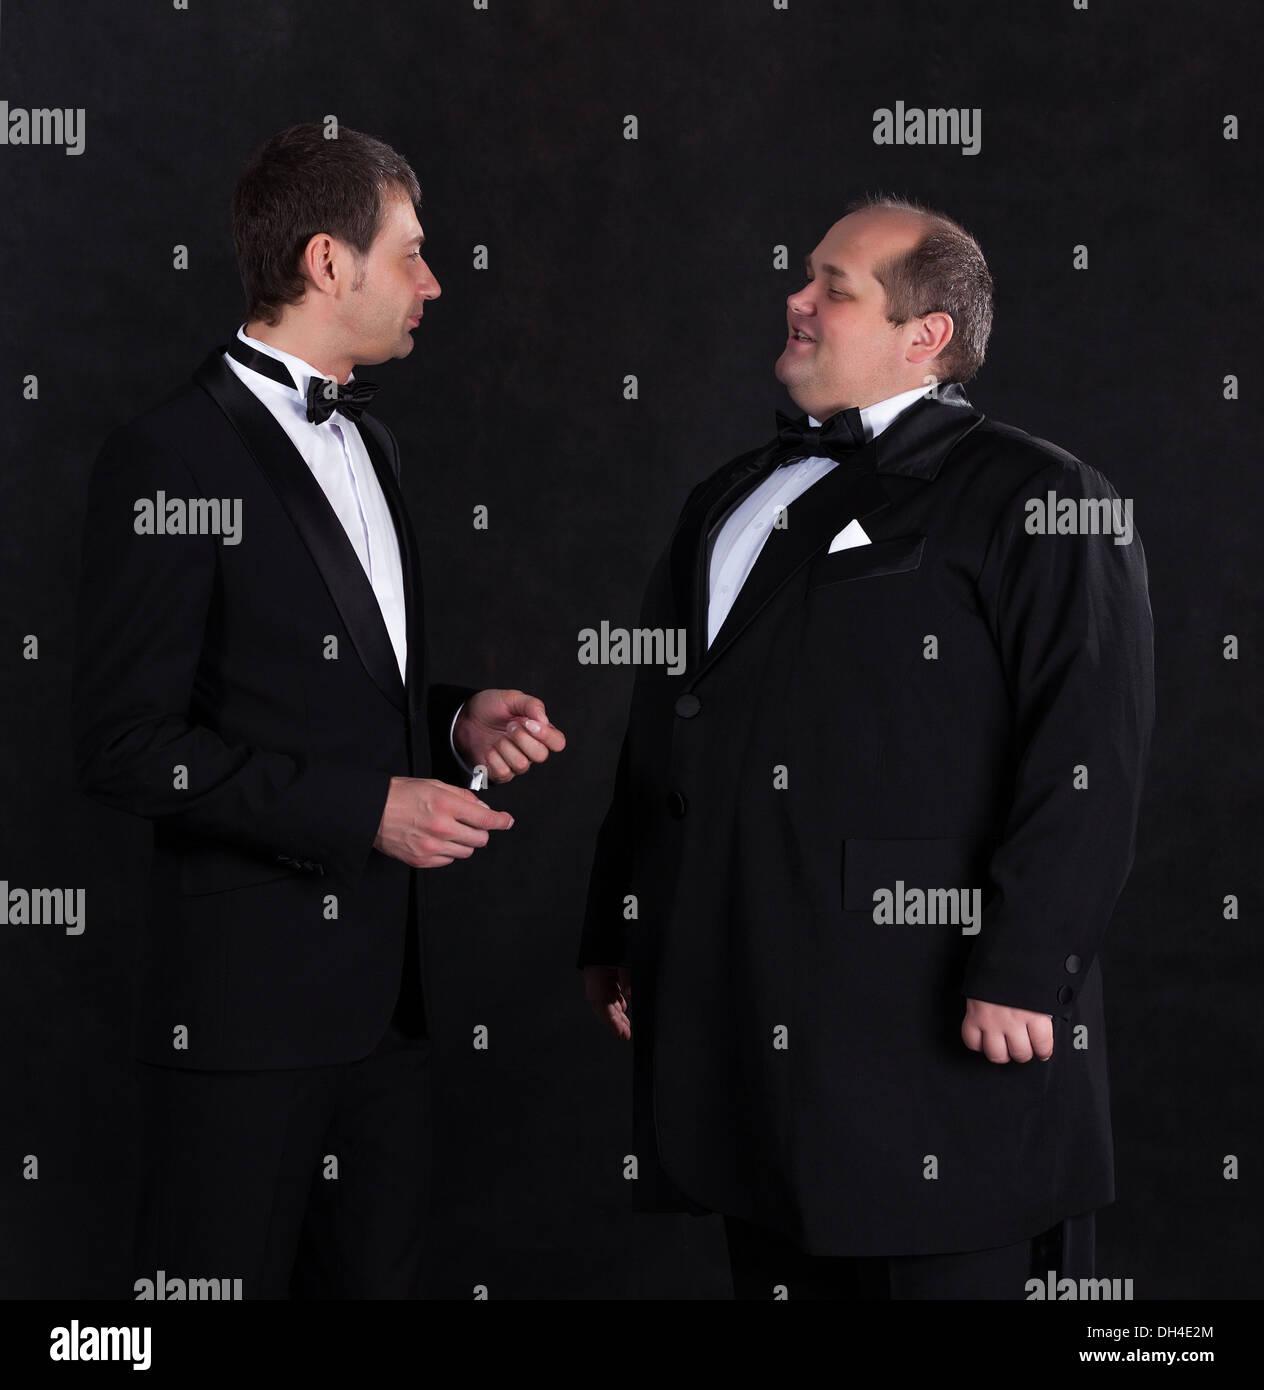 Two stylish businessman in tuxedos - Stock Image